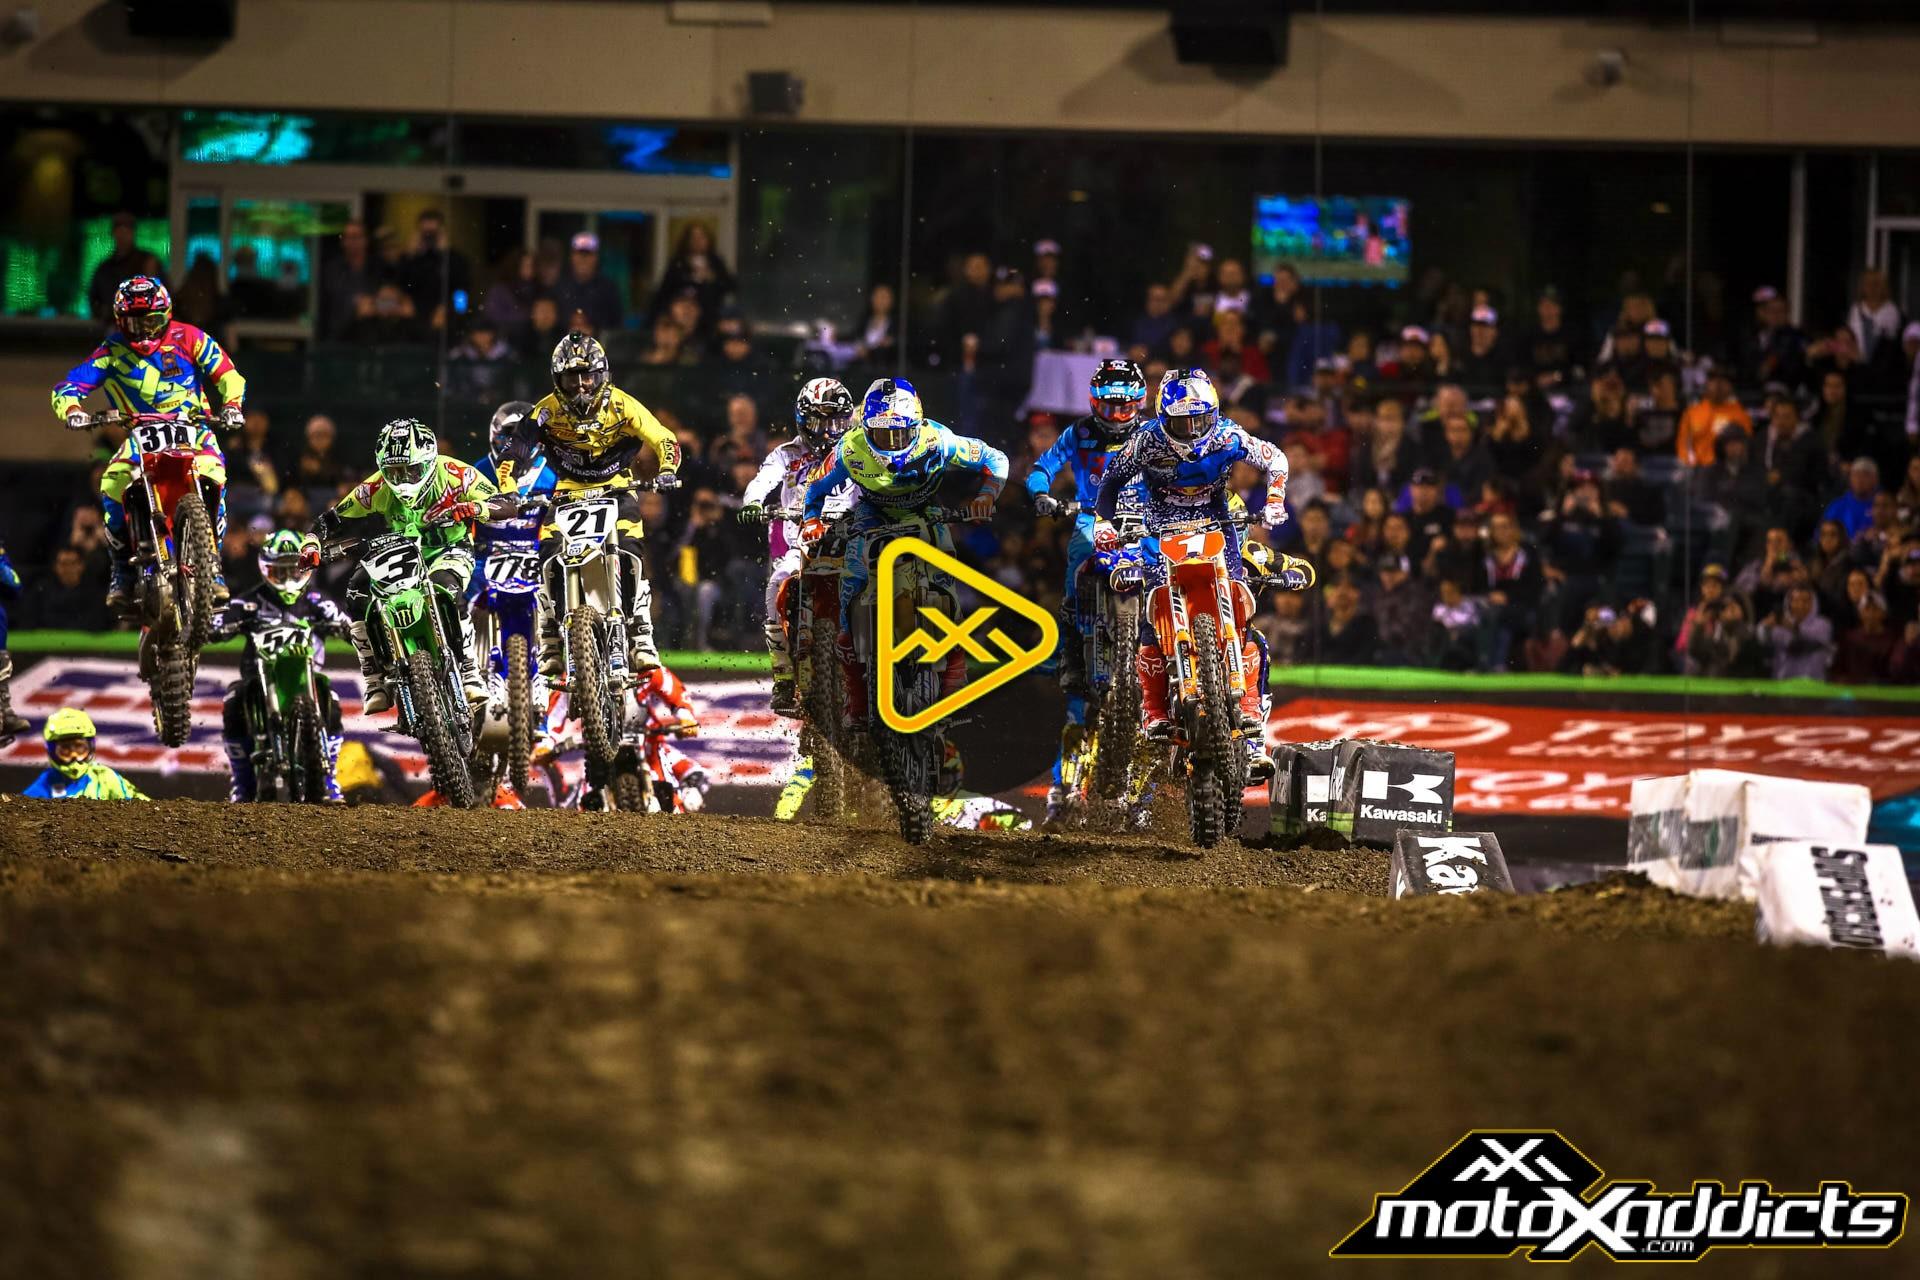 Watch Replay of 2016 Anaheim 2 SX – Full FOX Sports Broadcast